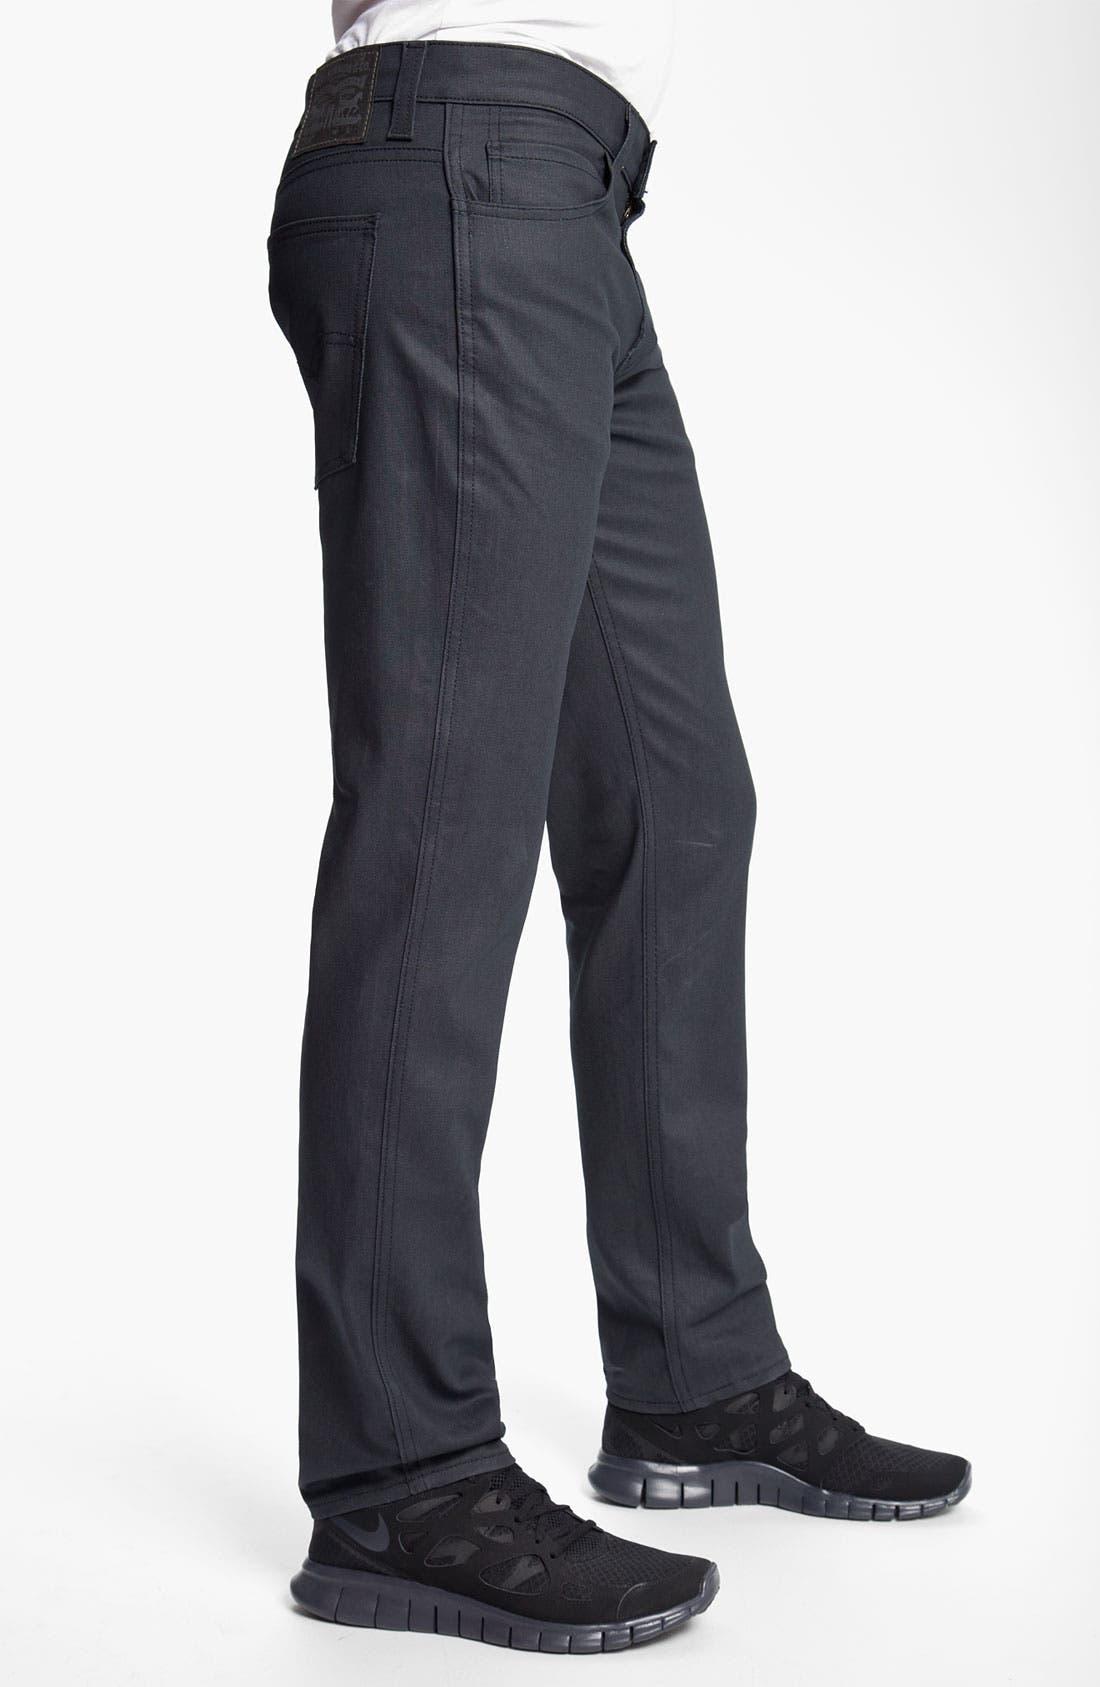 Alternate Image 3  - Levi's® '511' Slim Fit Jeans (Anthracite)